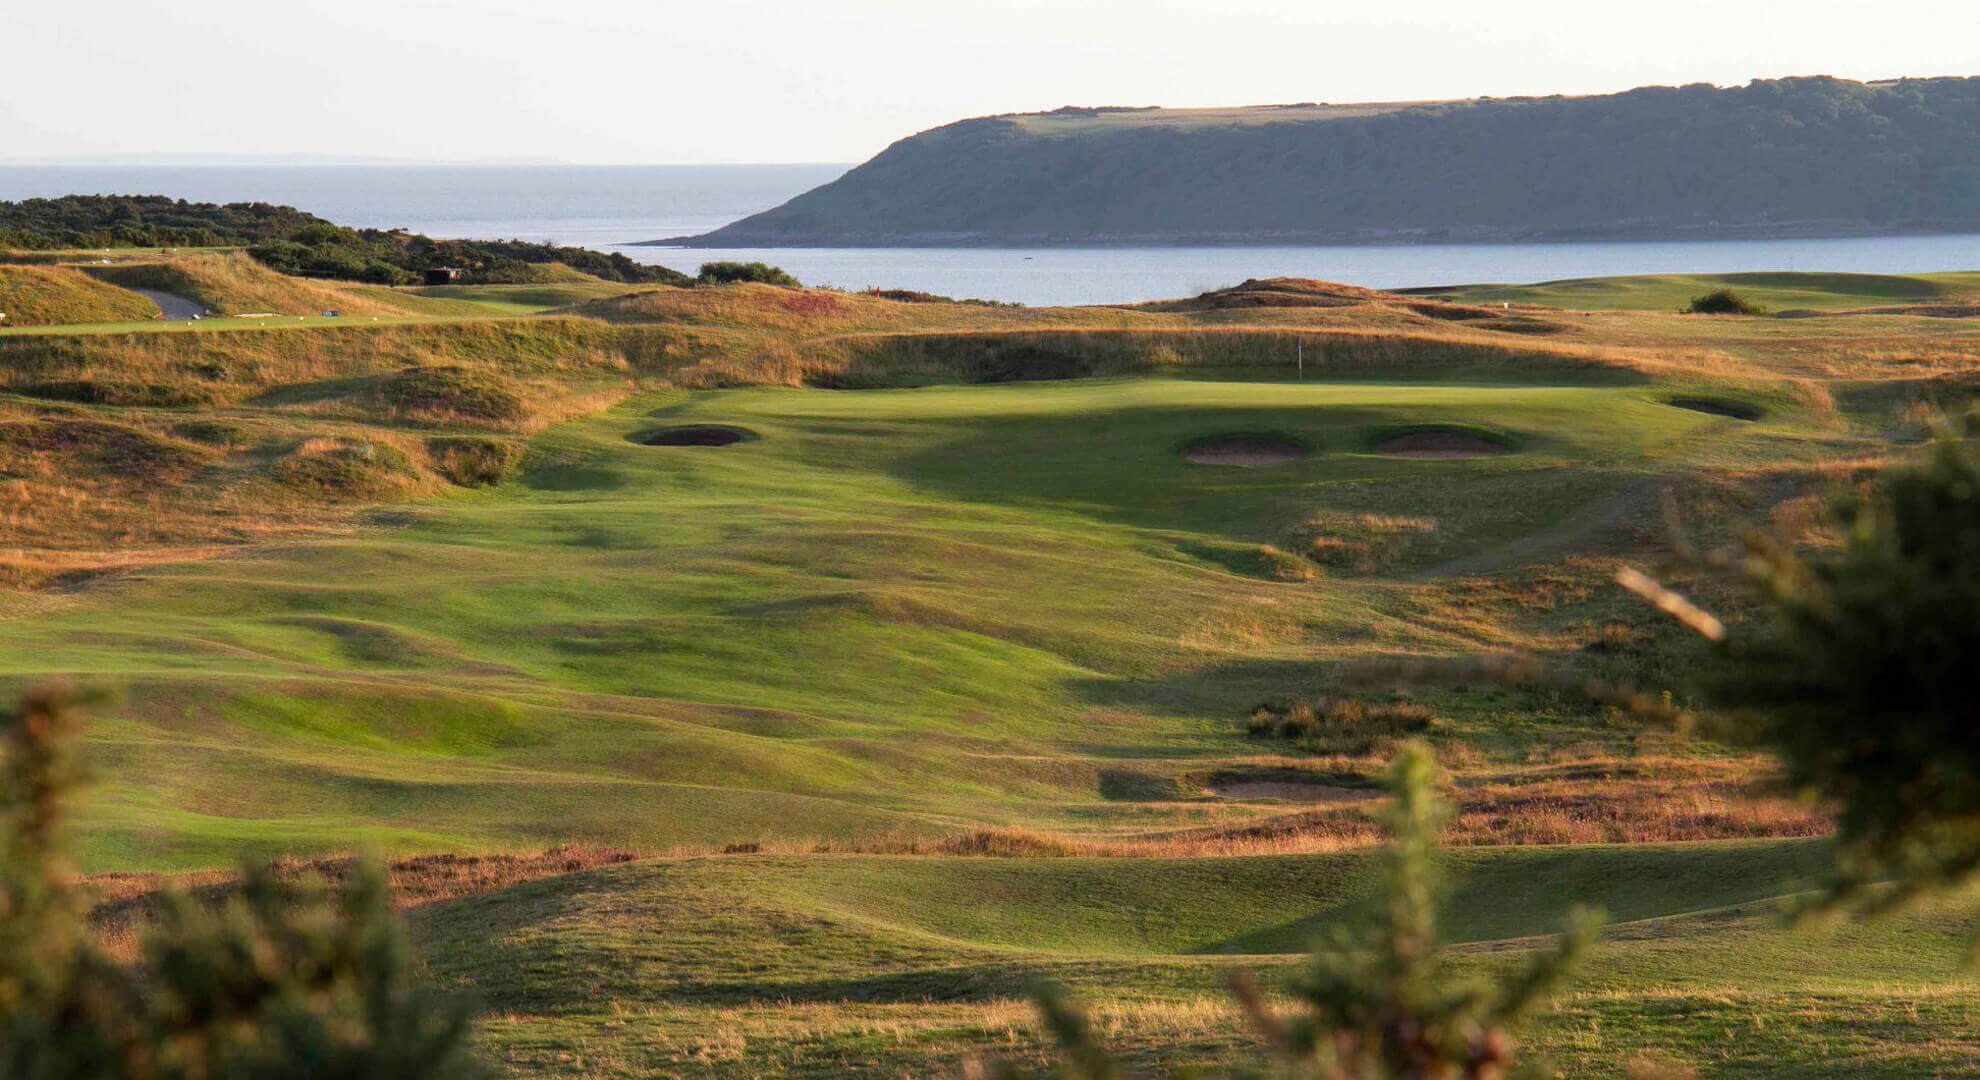 Pennard Golf Course, Wales